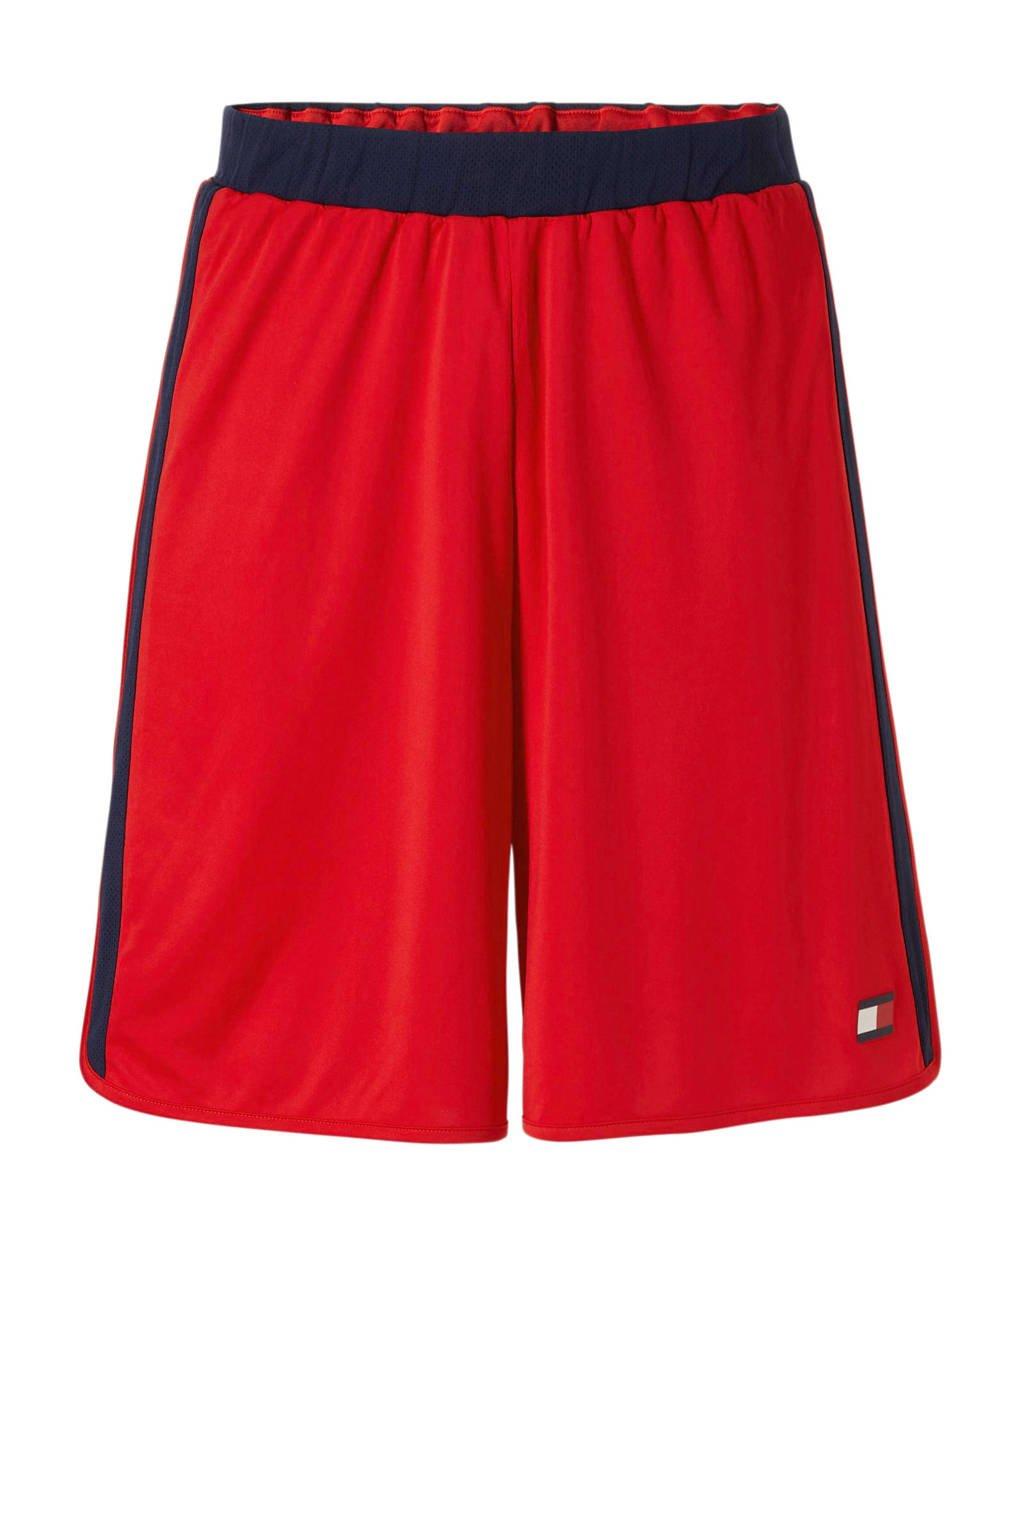 Tommy Sport   sportshort rood/donkerblauw, Rood/donkerblauw